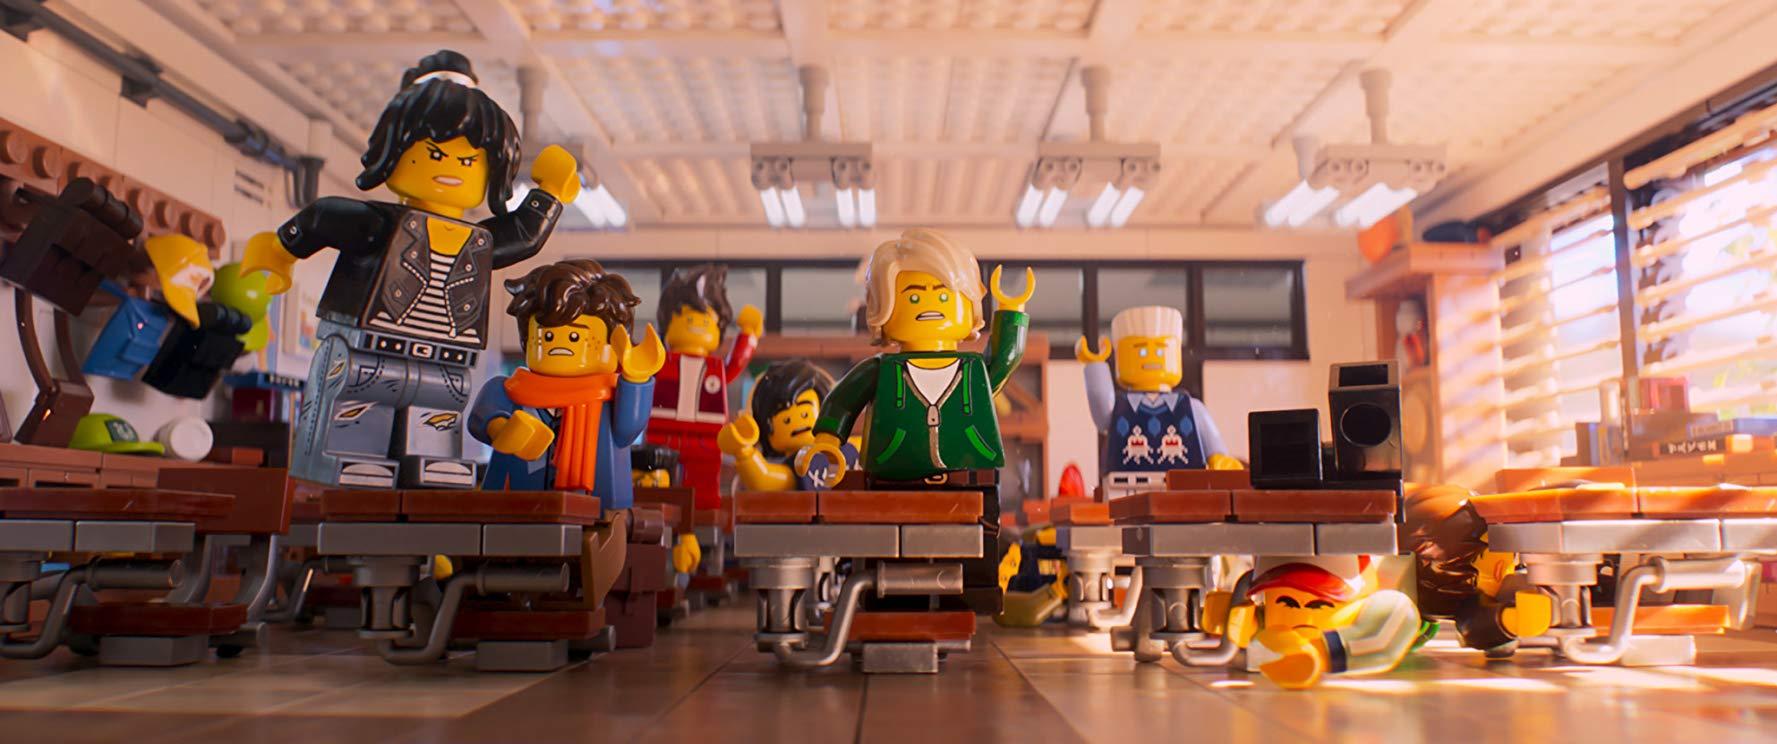 Reseña de Lego Ninjago: La Película - The LEGO Ninjago Movie (2017)